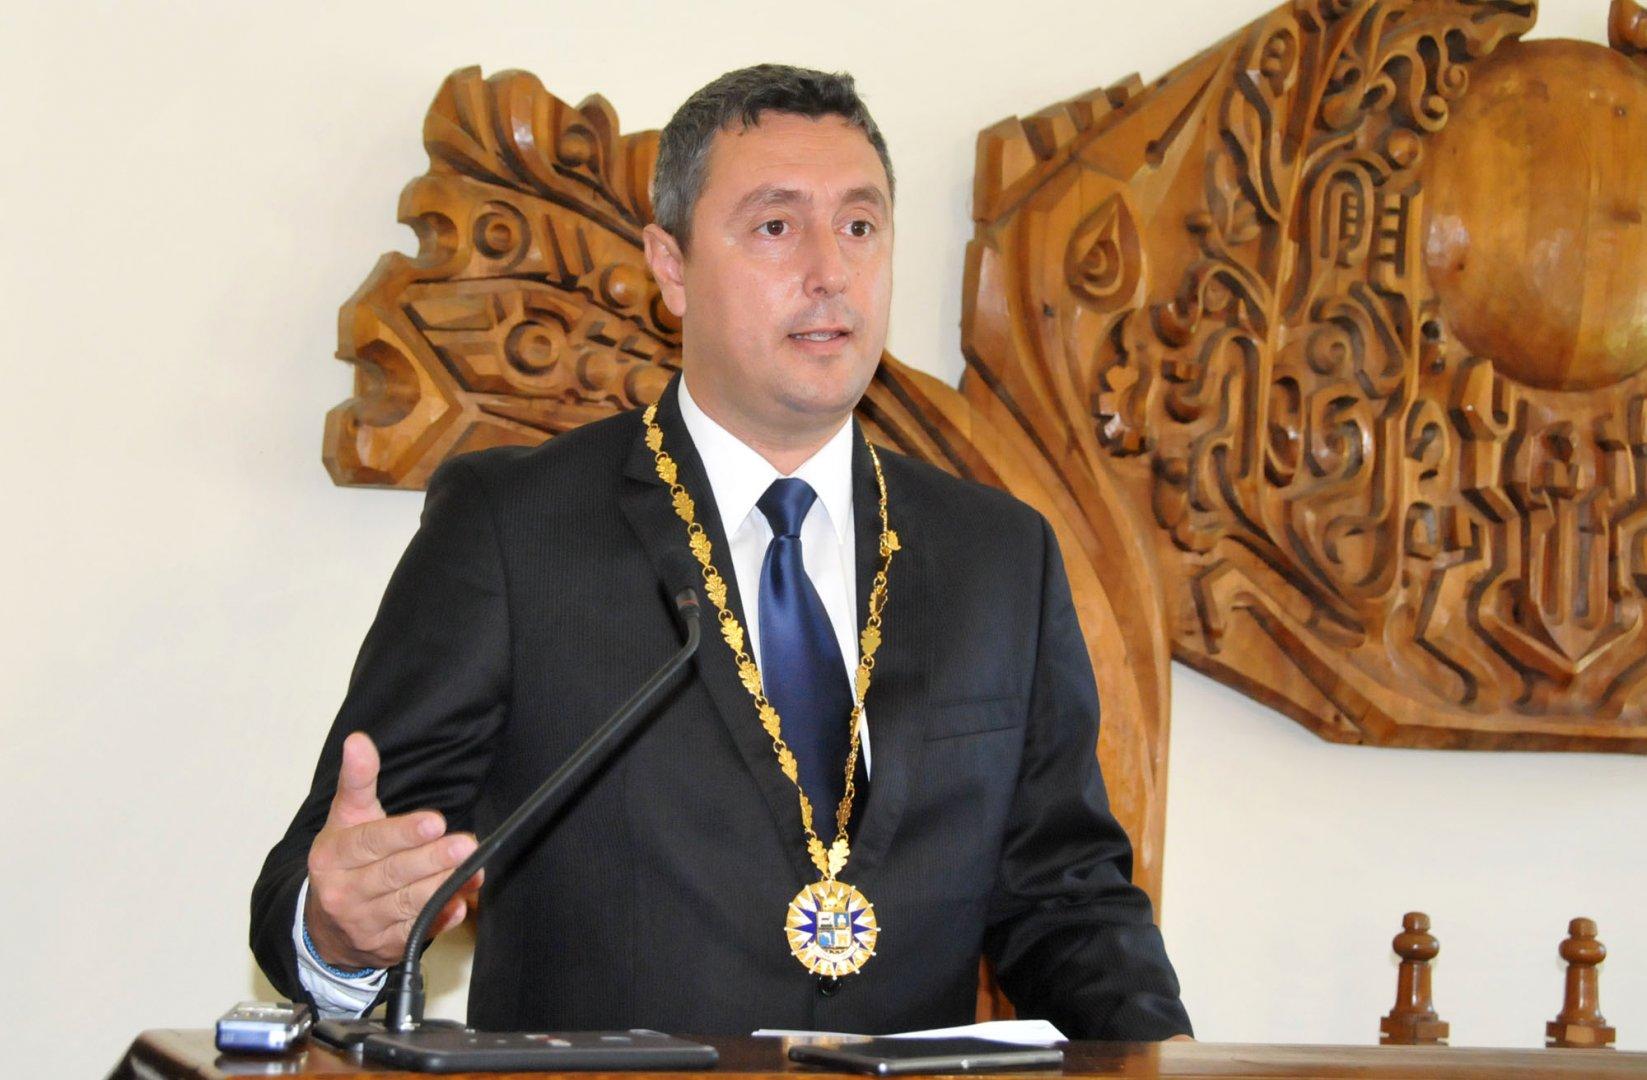 Не сме делили проектите през времето, каза кметът Георги Лапчев. Снимка Лина Главинова